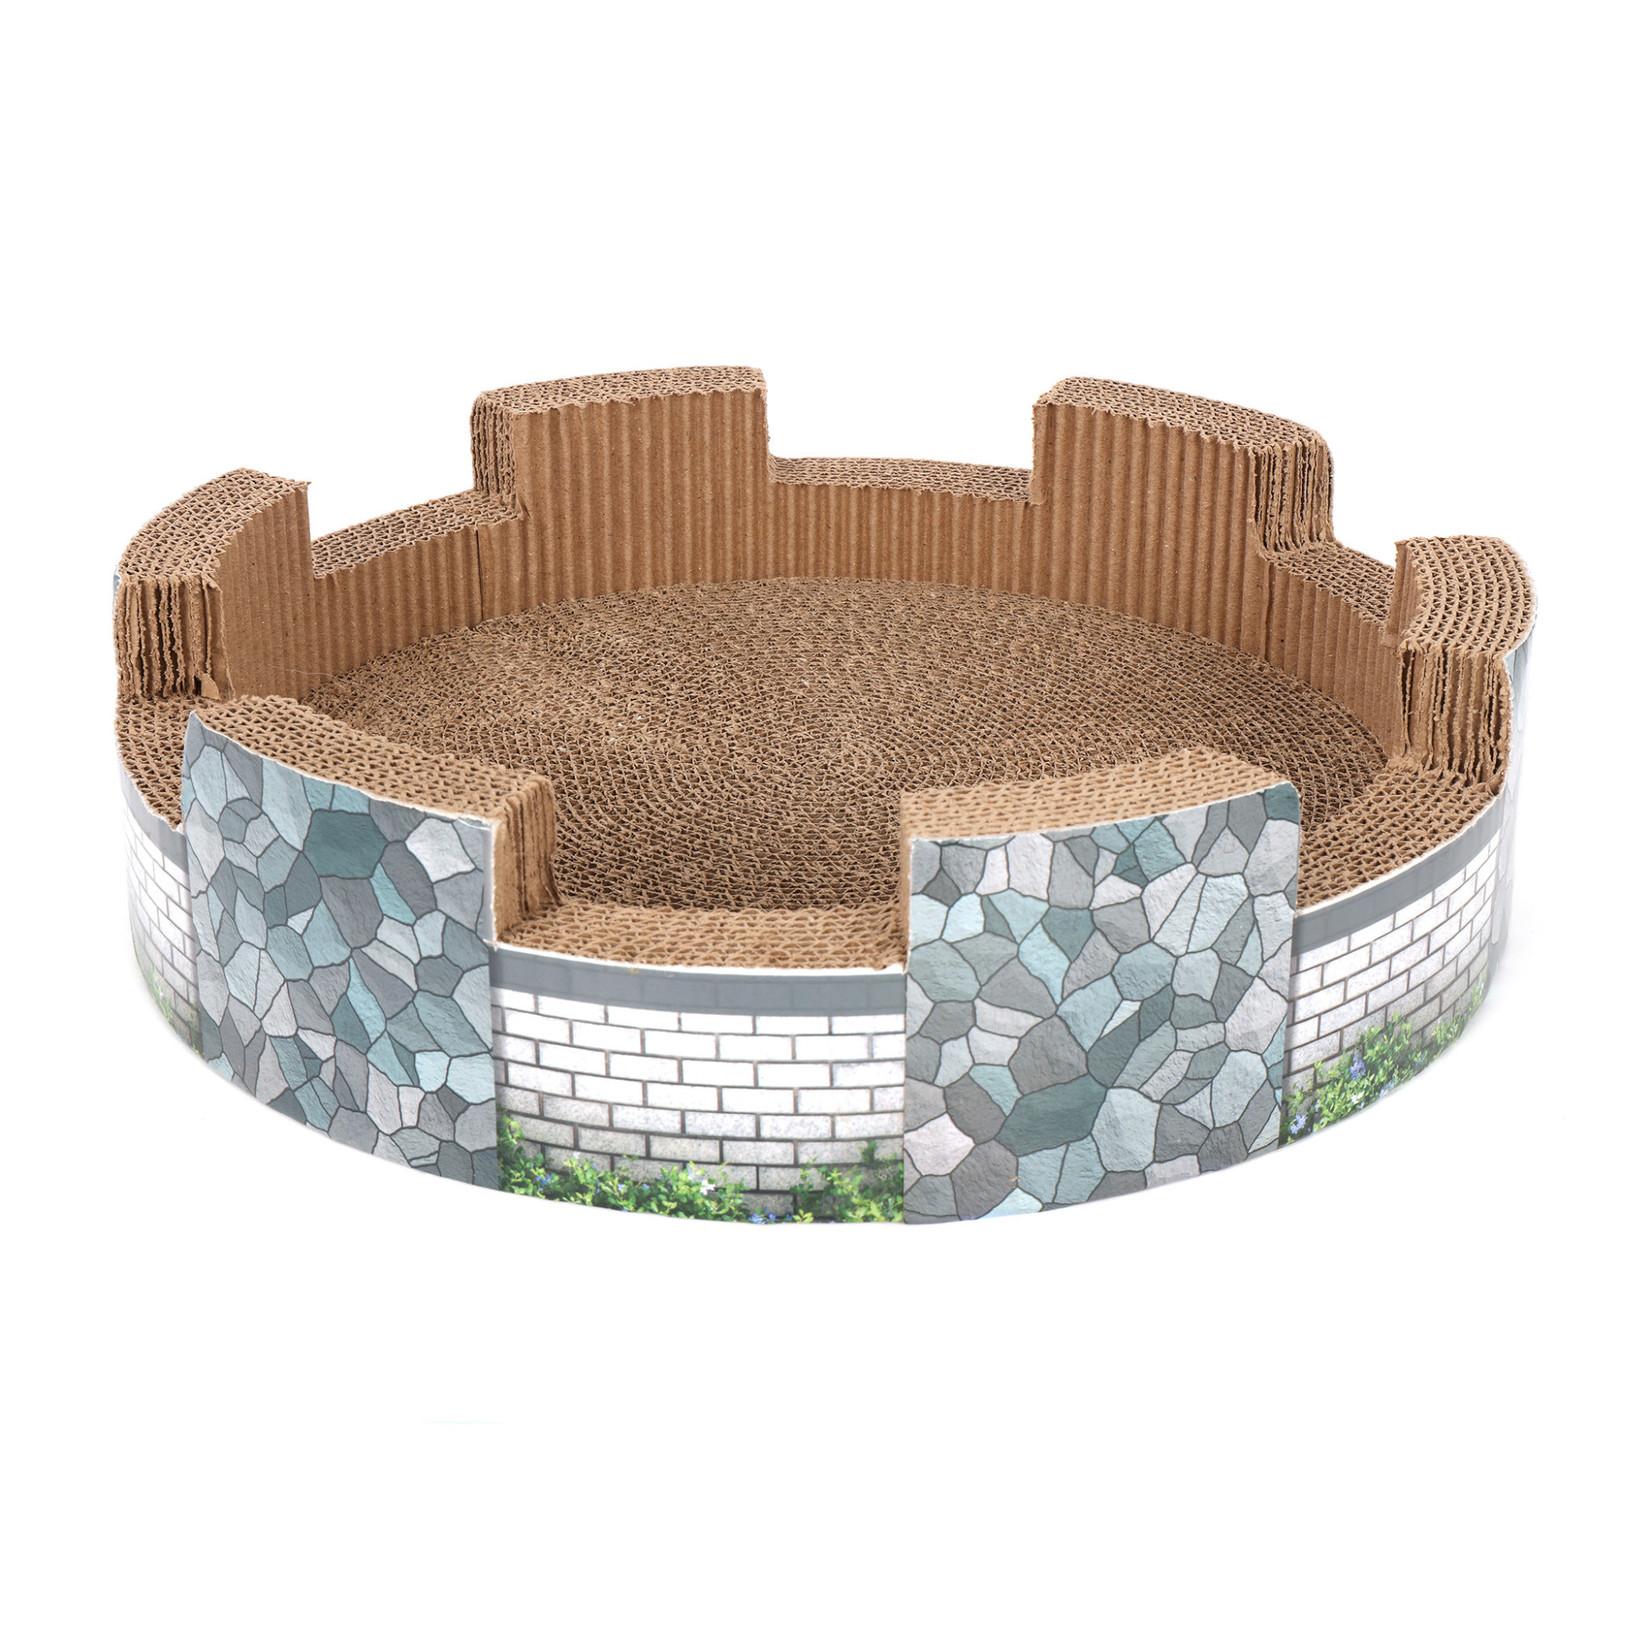 Ware Mfg. Ware Corrugated Cat Castle Scratcher